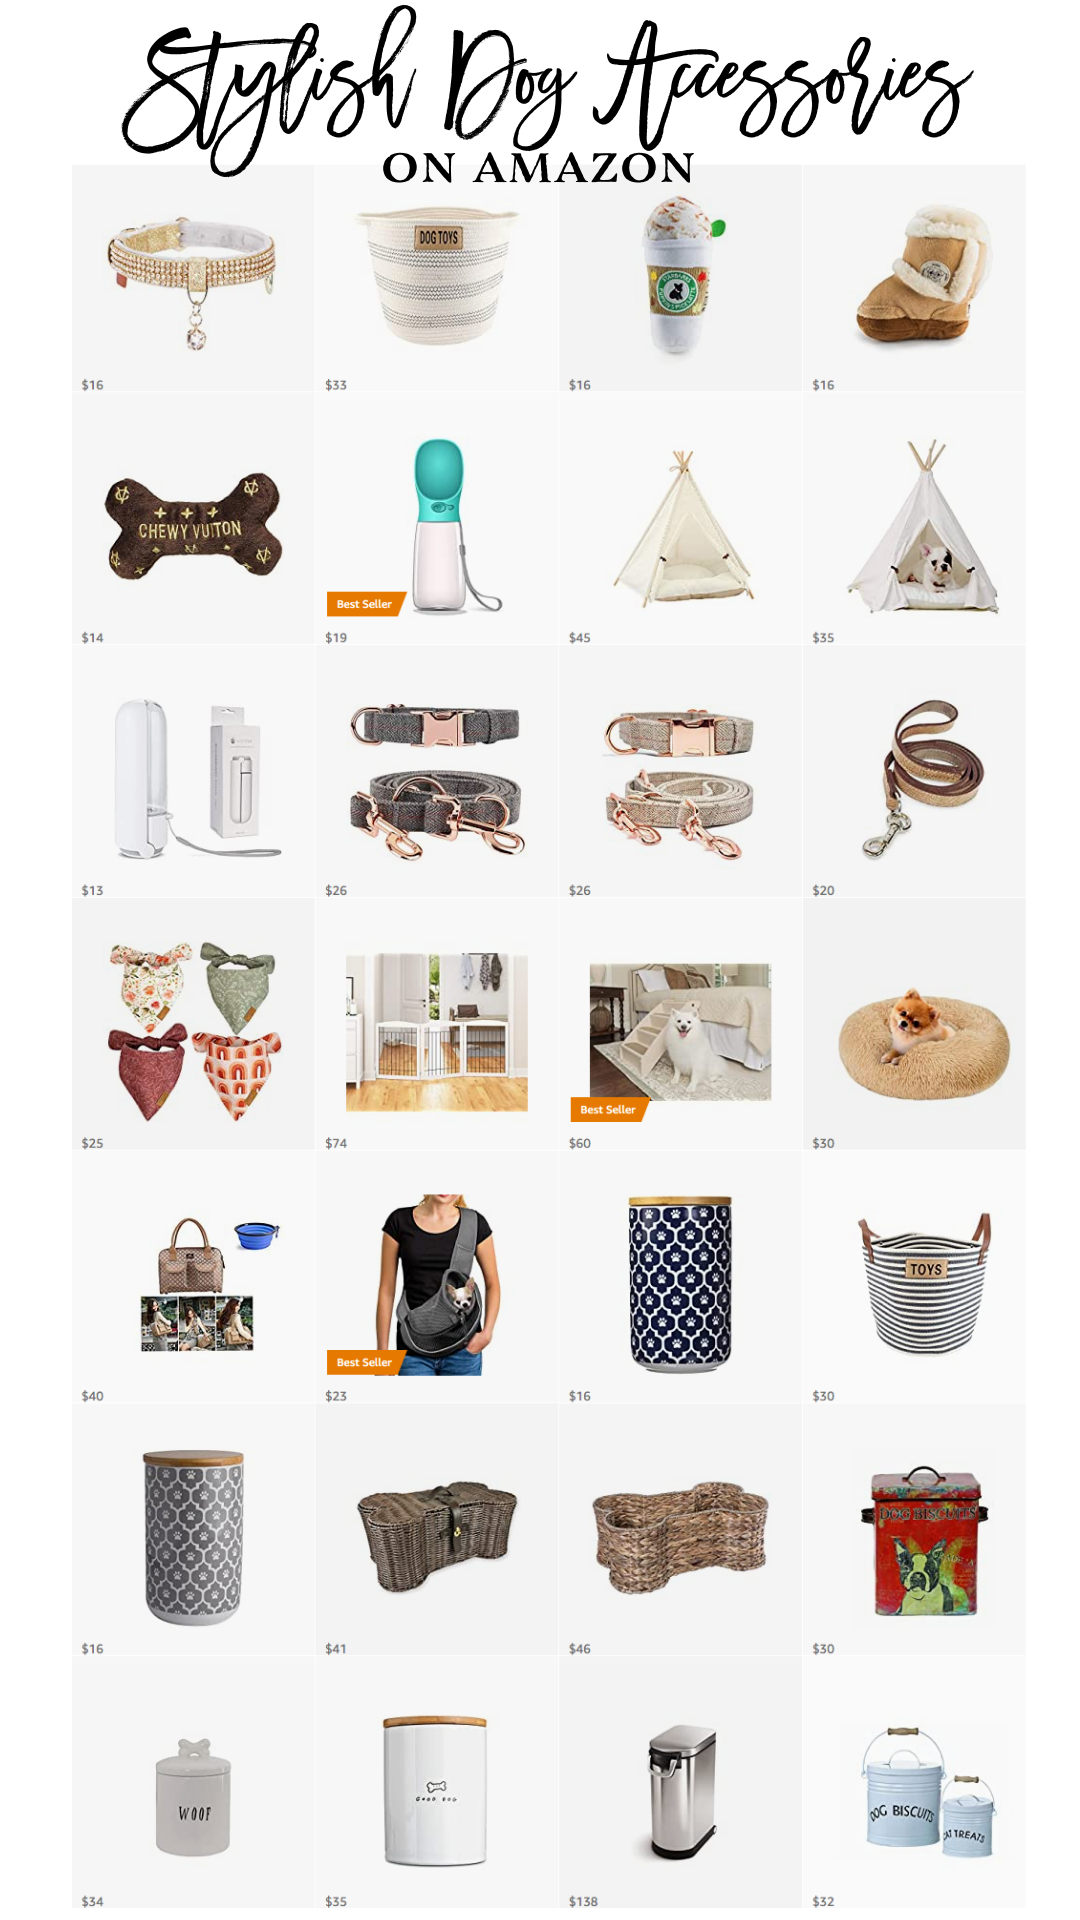 Stylish-Dog-Accessories-on-Amazon